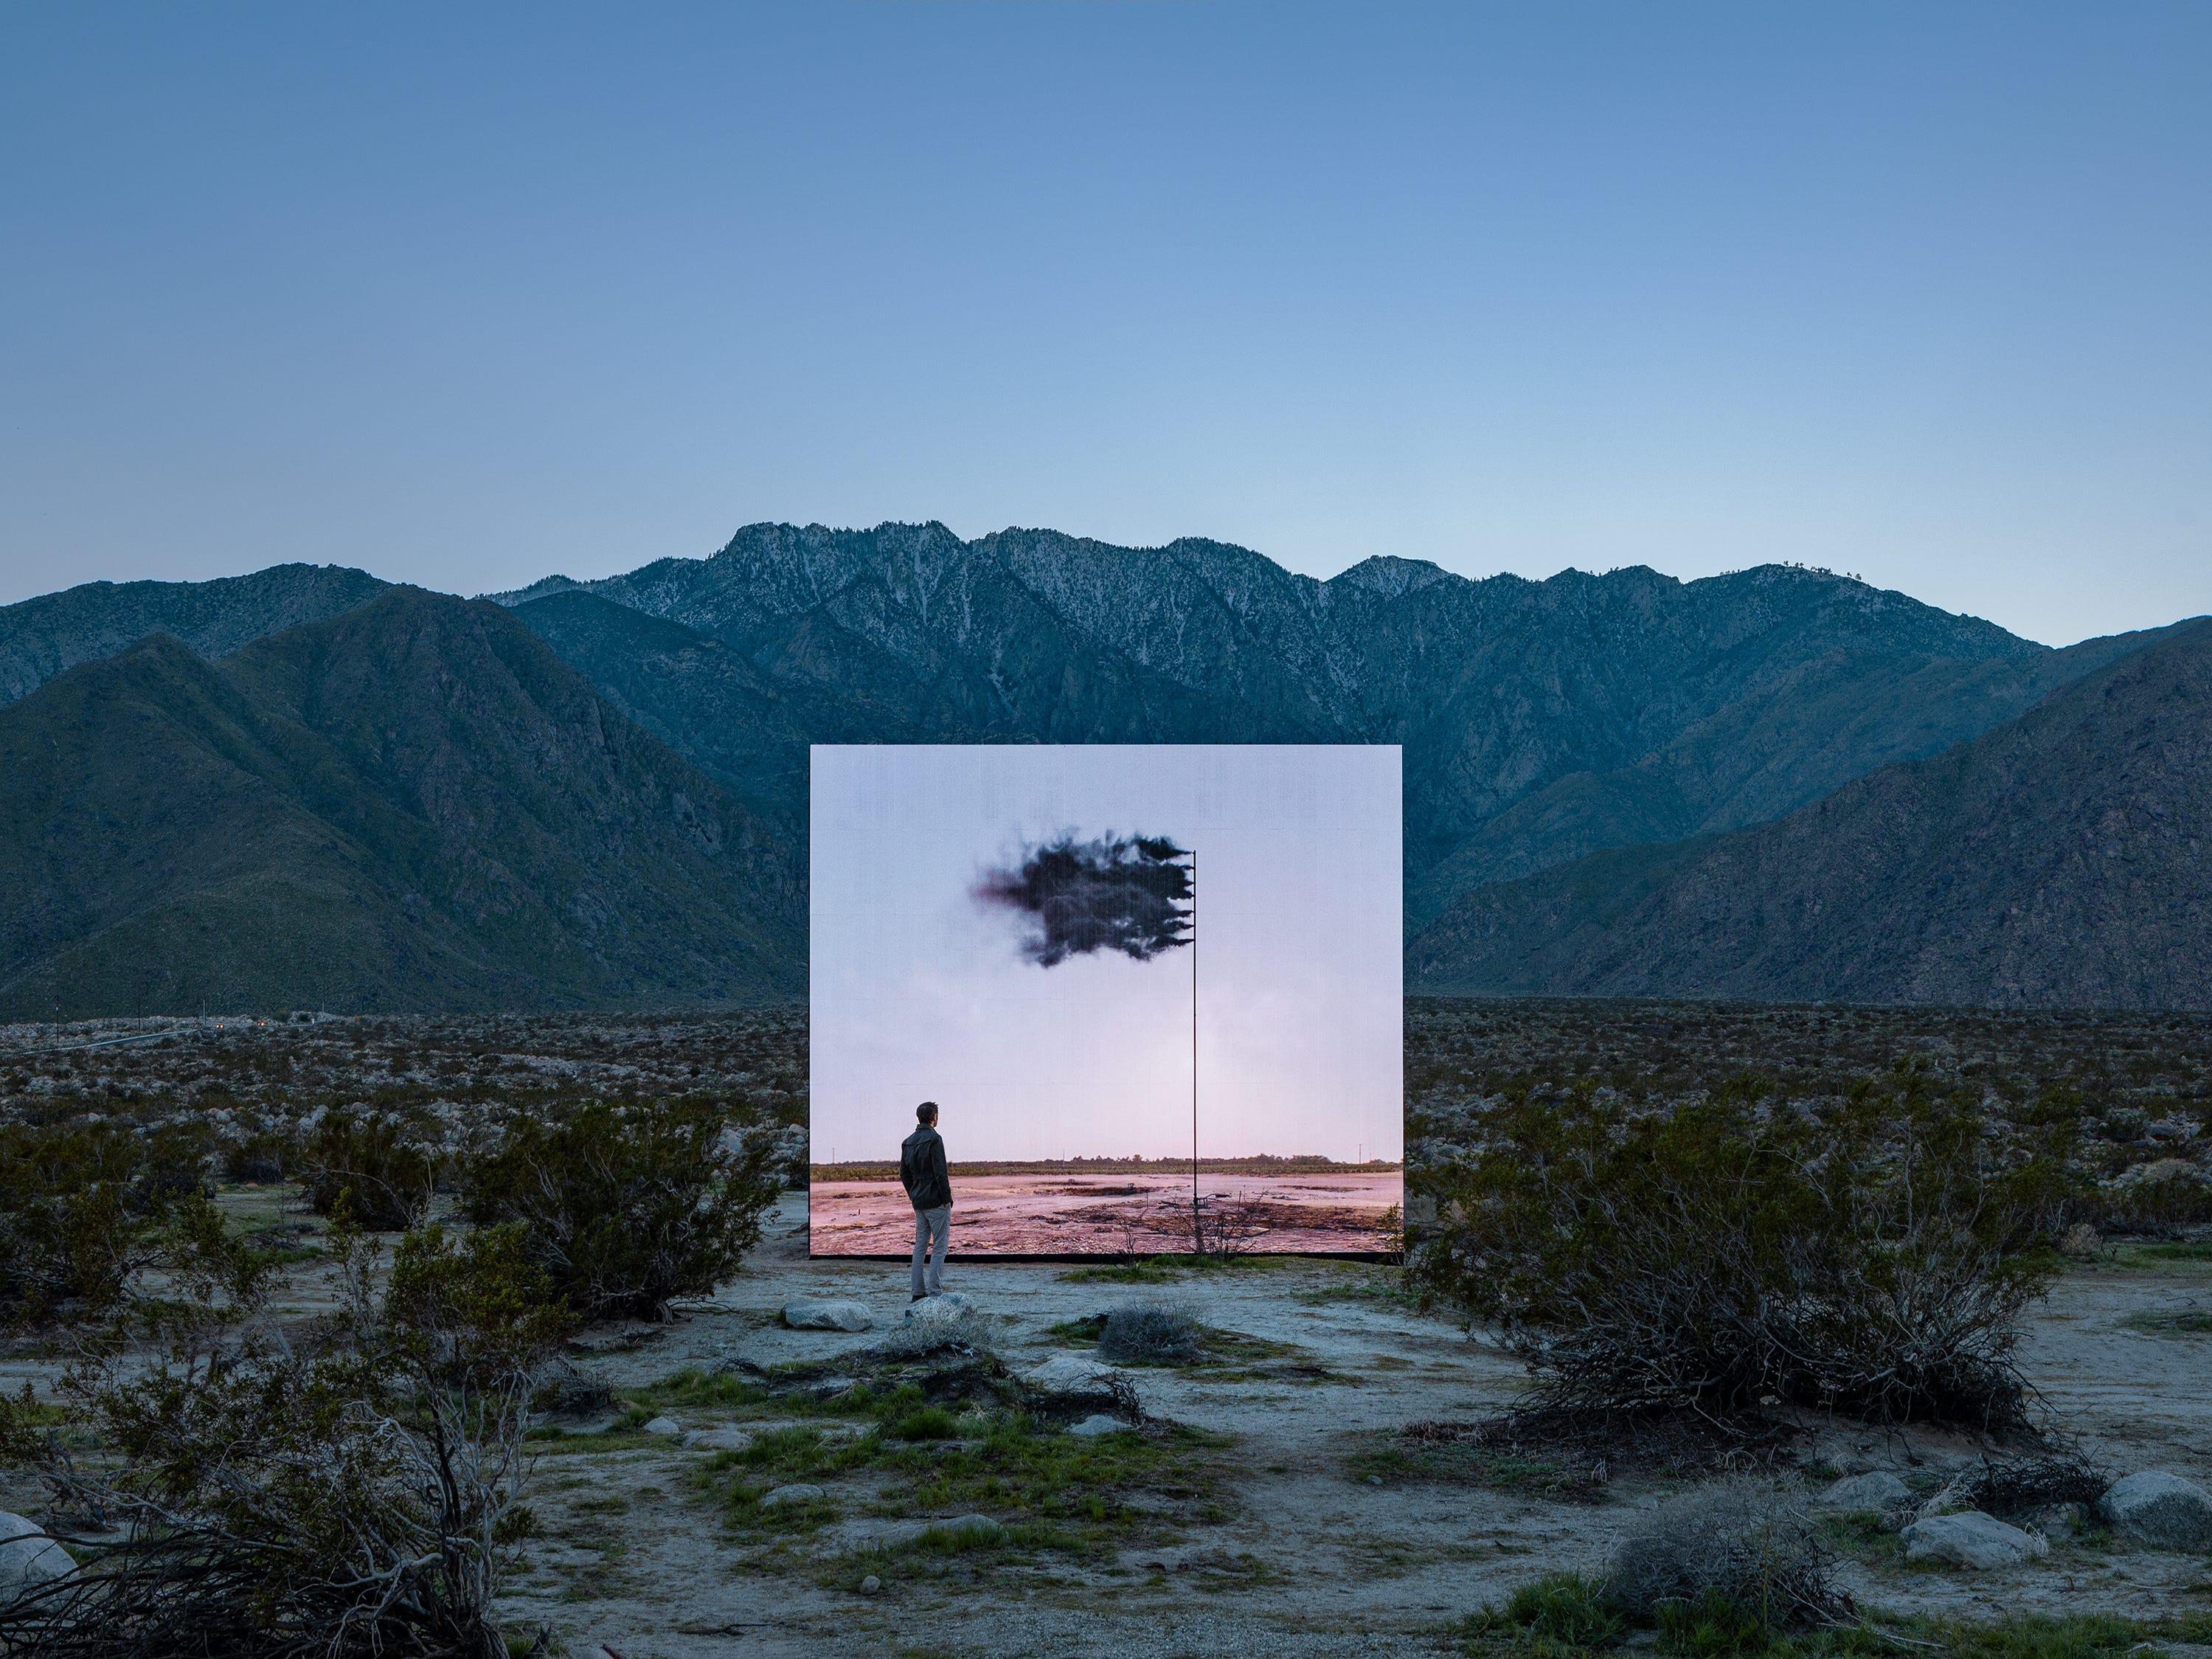 """Western Flag (Spindletop, Texas)"" by John Gerrard for Desert X 2019"